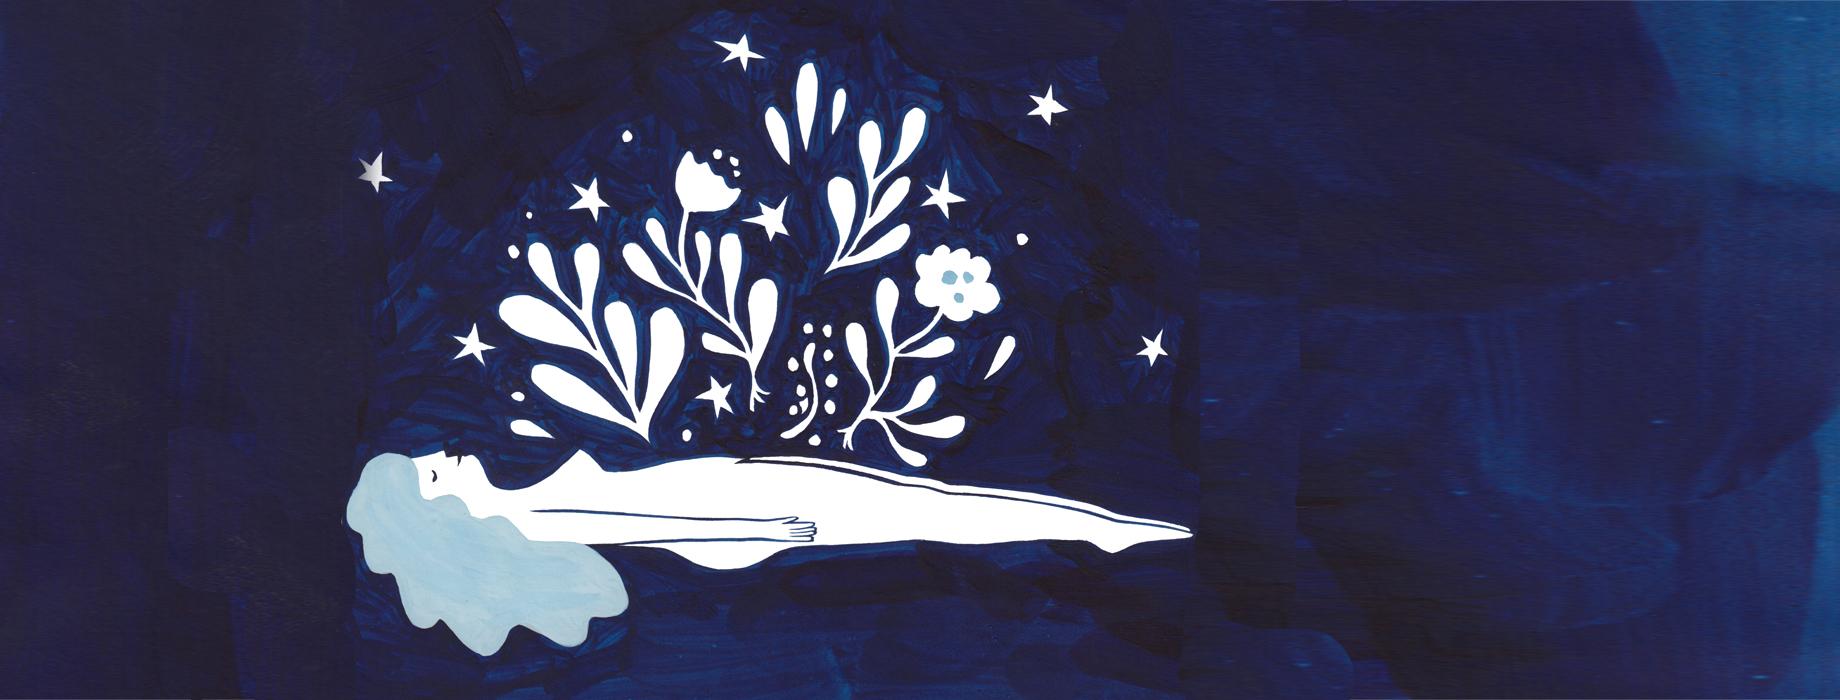 Yoganidra, tune into nature's lullaby